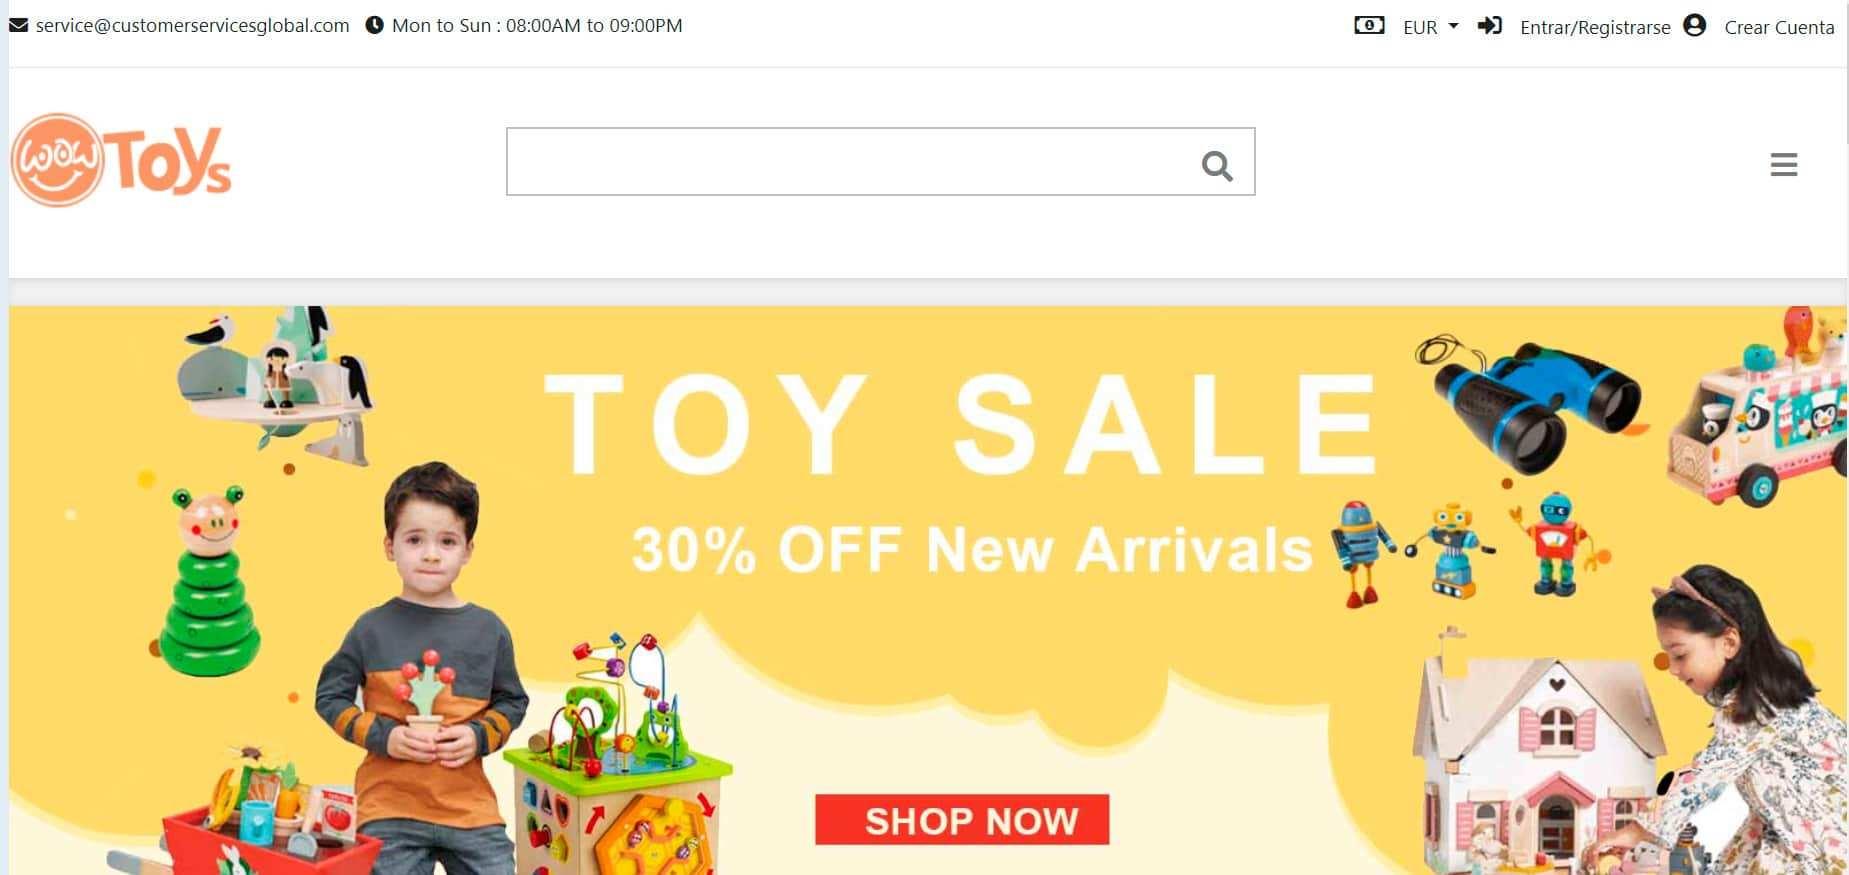 Navvrnd.com Tienda Online Falsa Juguetes